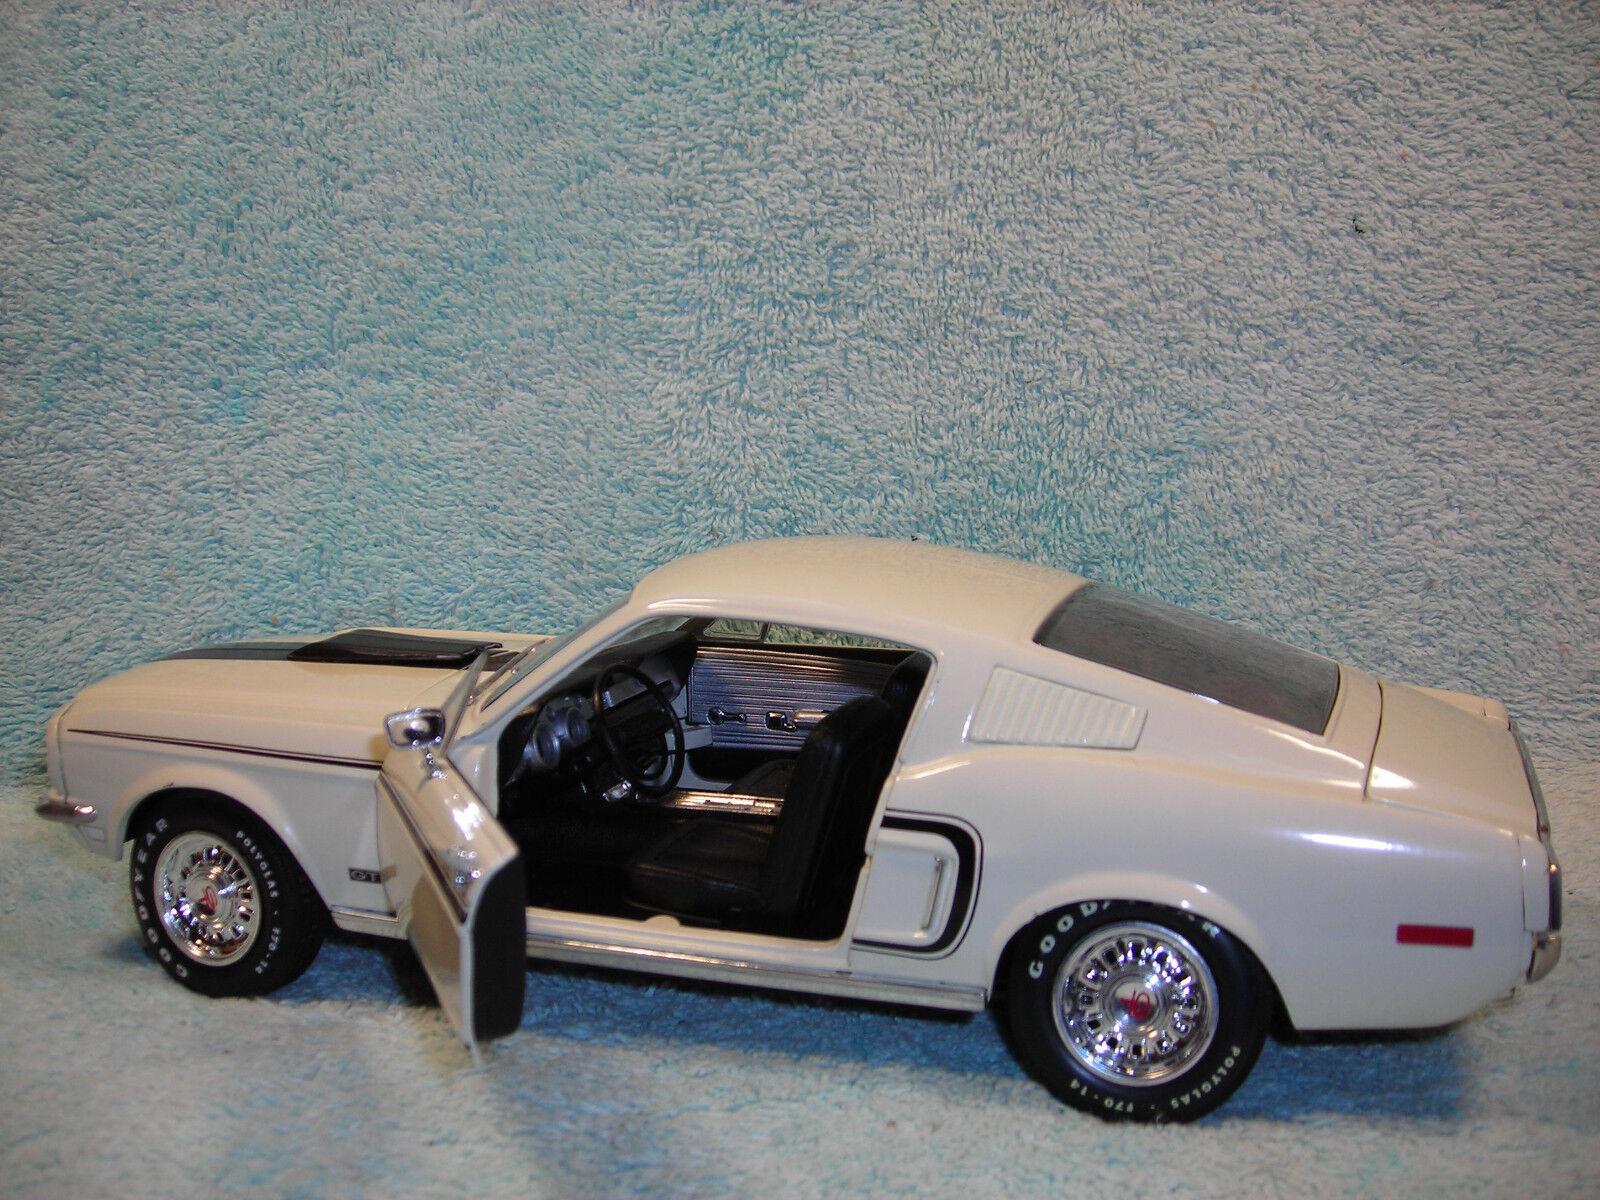 1 18 1958 1958 1958 Ford Mustang GT CJ428 en blancoo Negro Tira por ERTL American Muscle. 9764ca